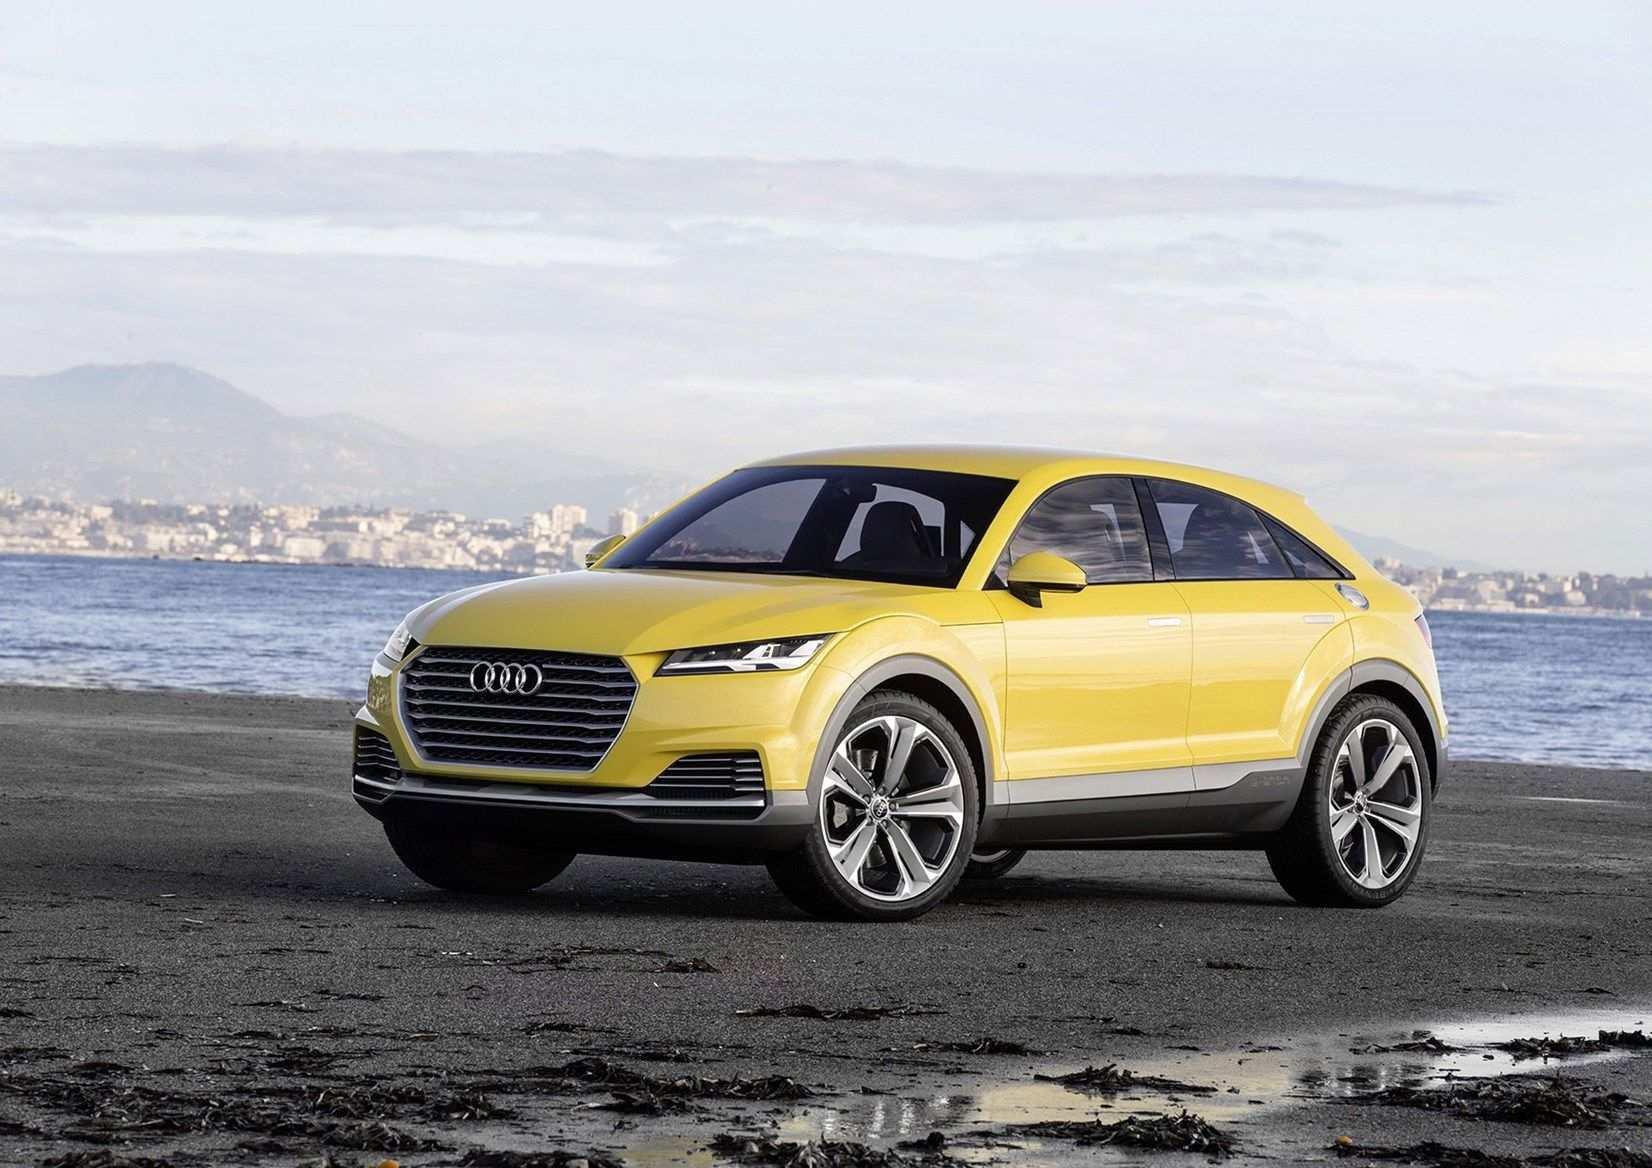 91 New 2020 Audi Q4s Price with 2020 Audi Q4s